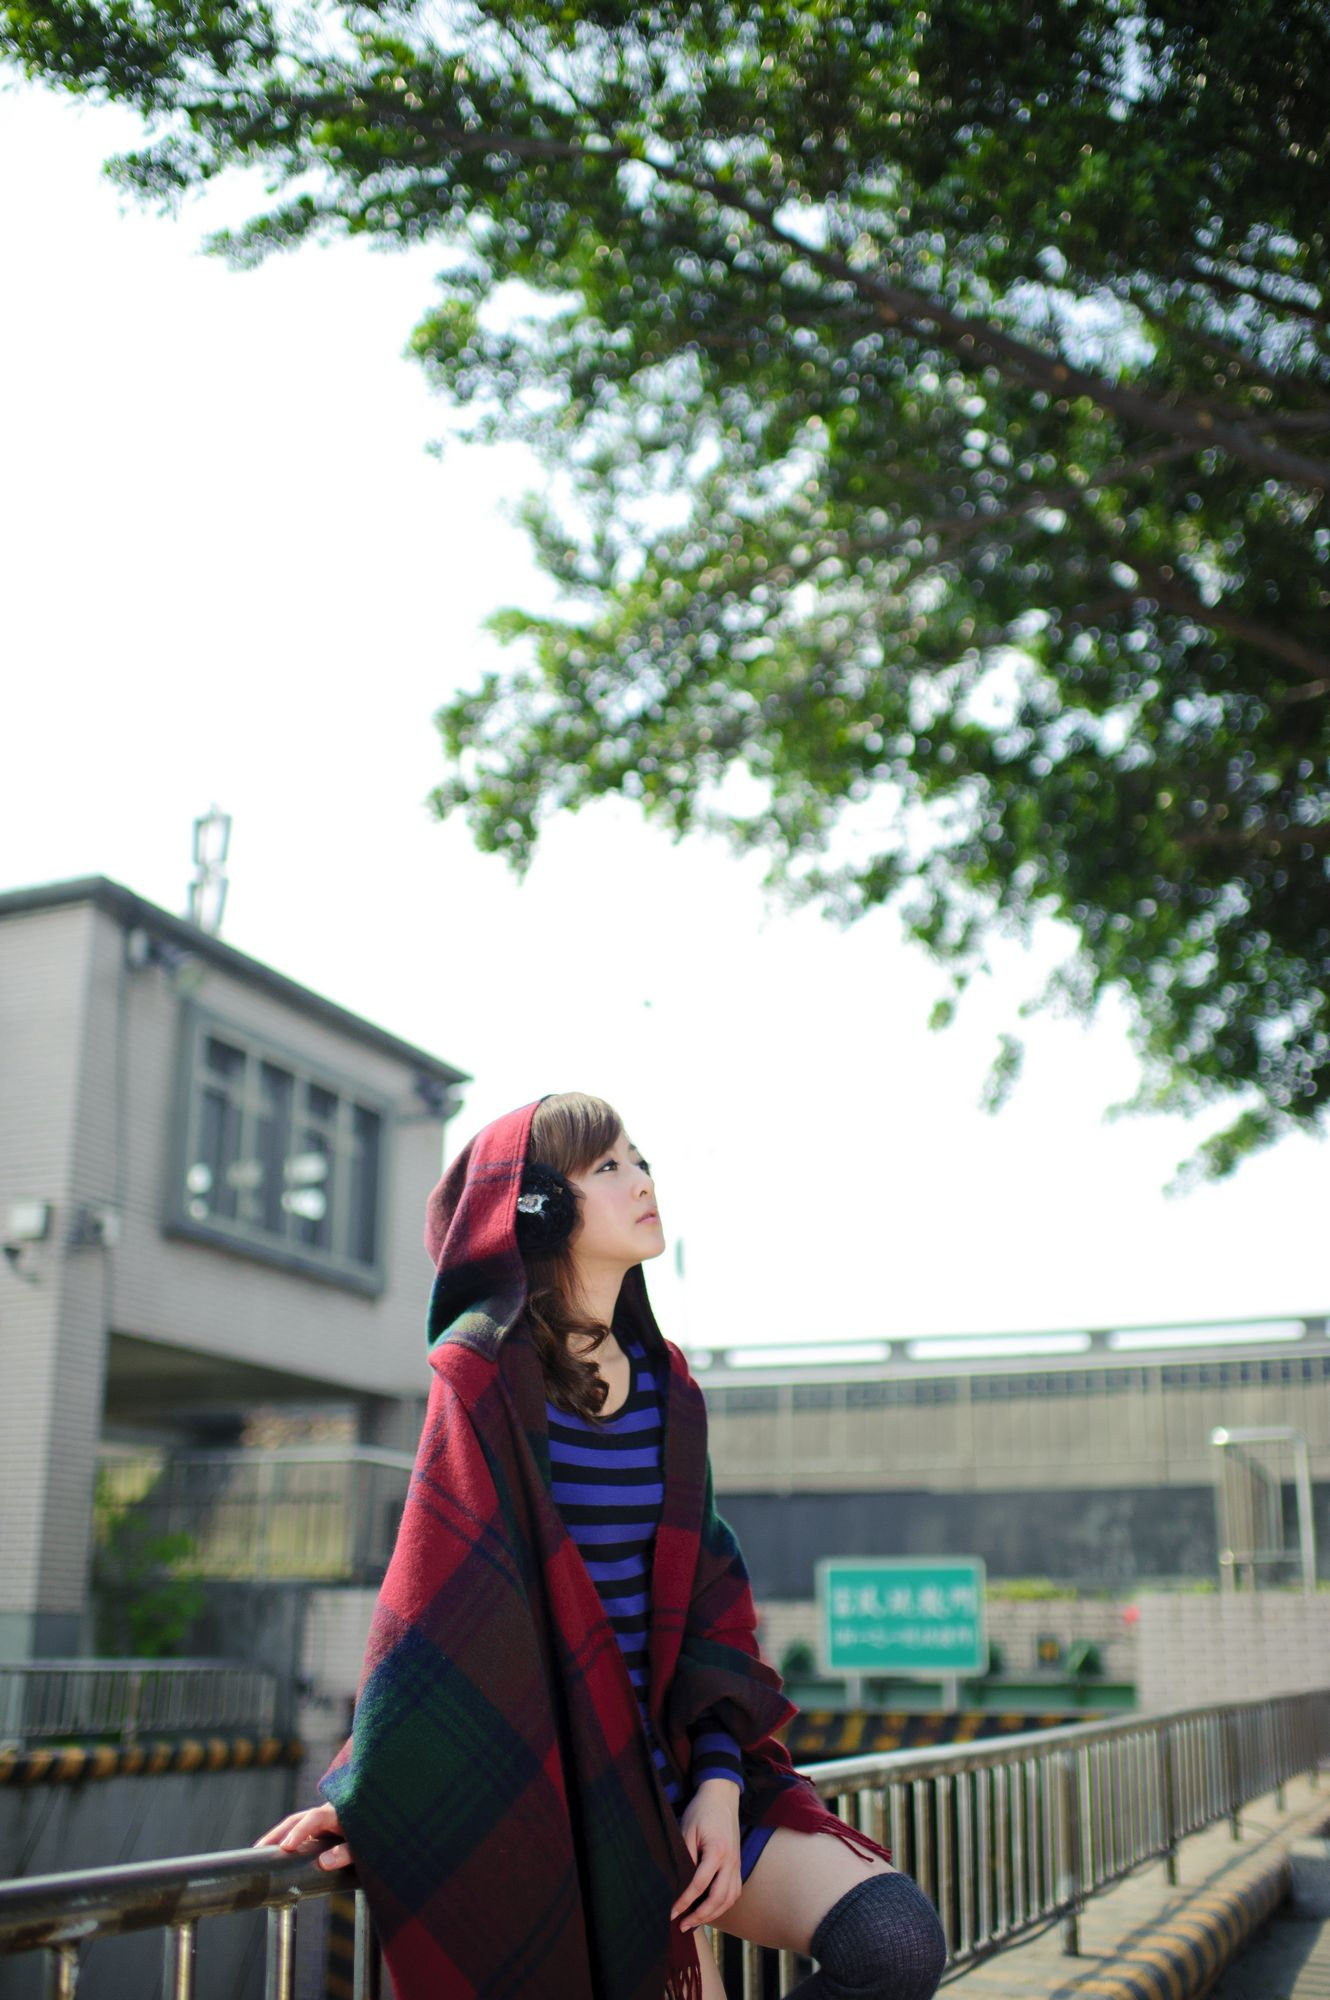 VOL.1428 [台湾正妹]清新街拍阳光正妹:张凯洁(张允霏,果子MM)高品质写真套图(54P)